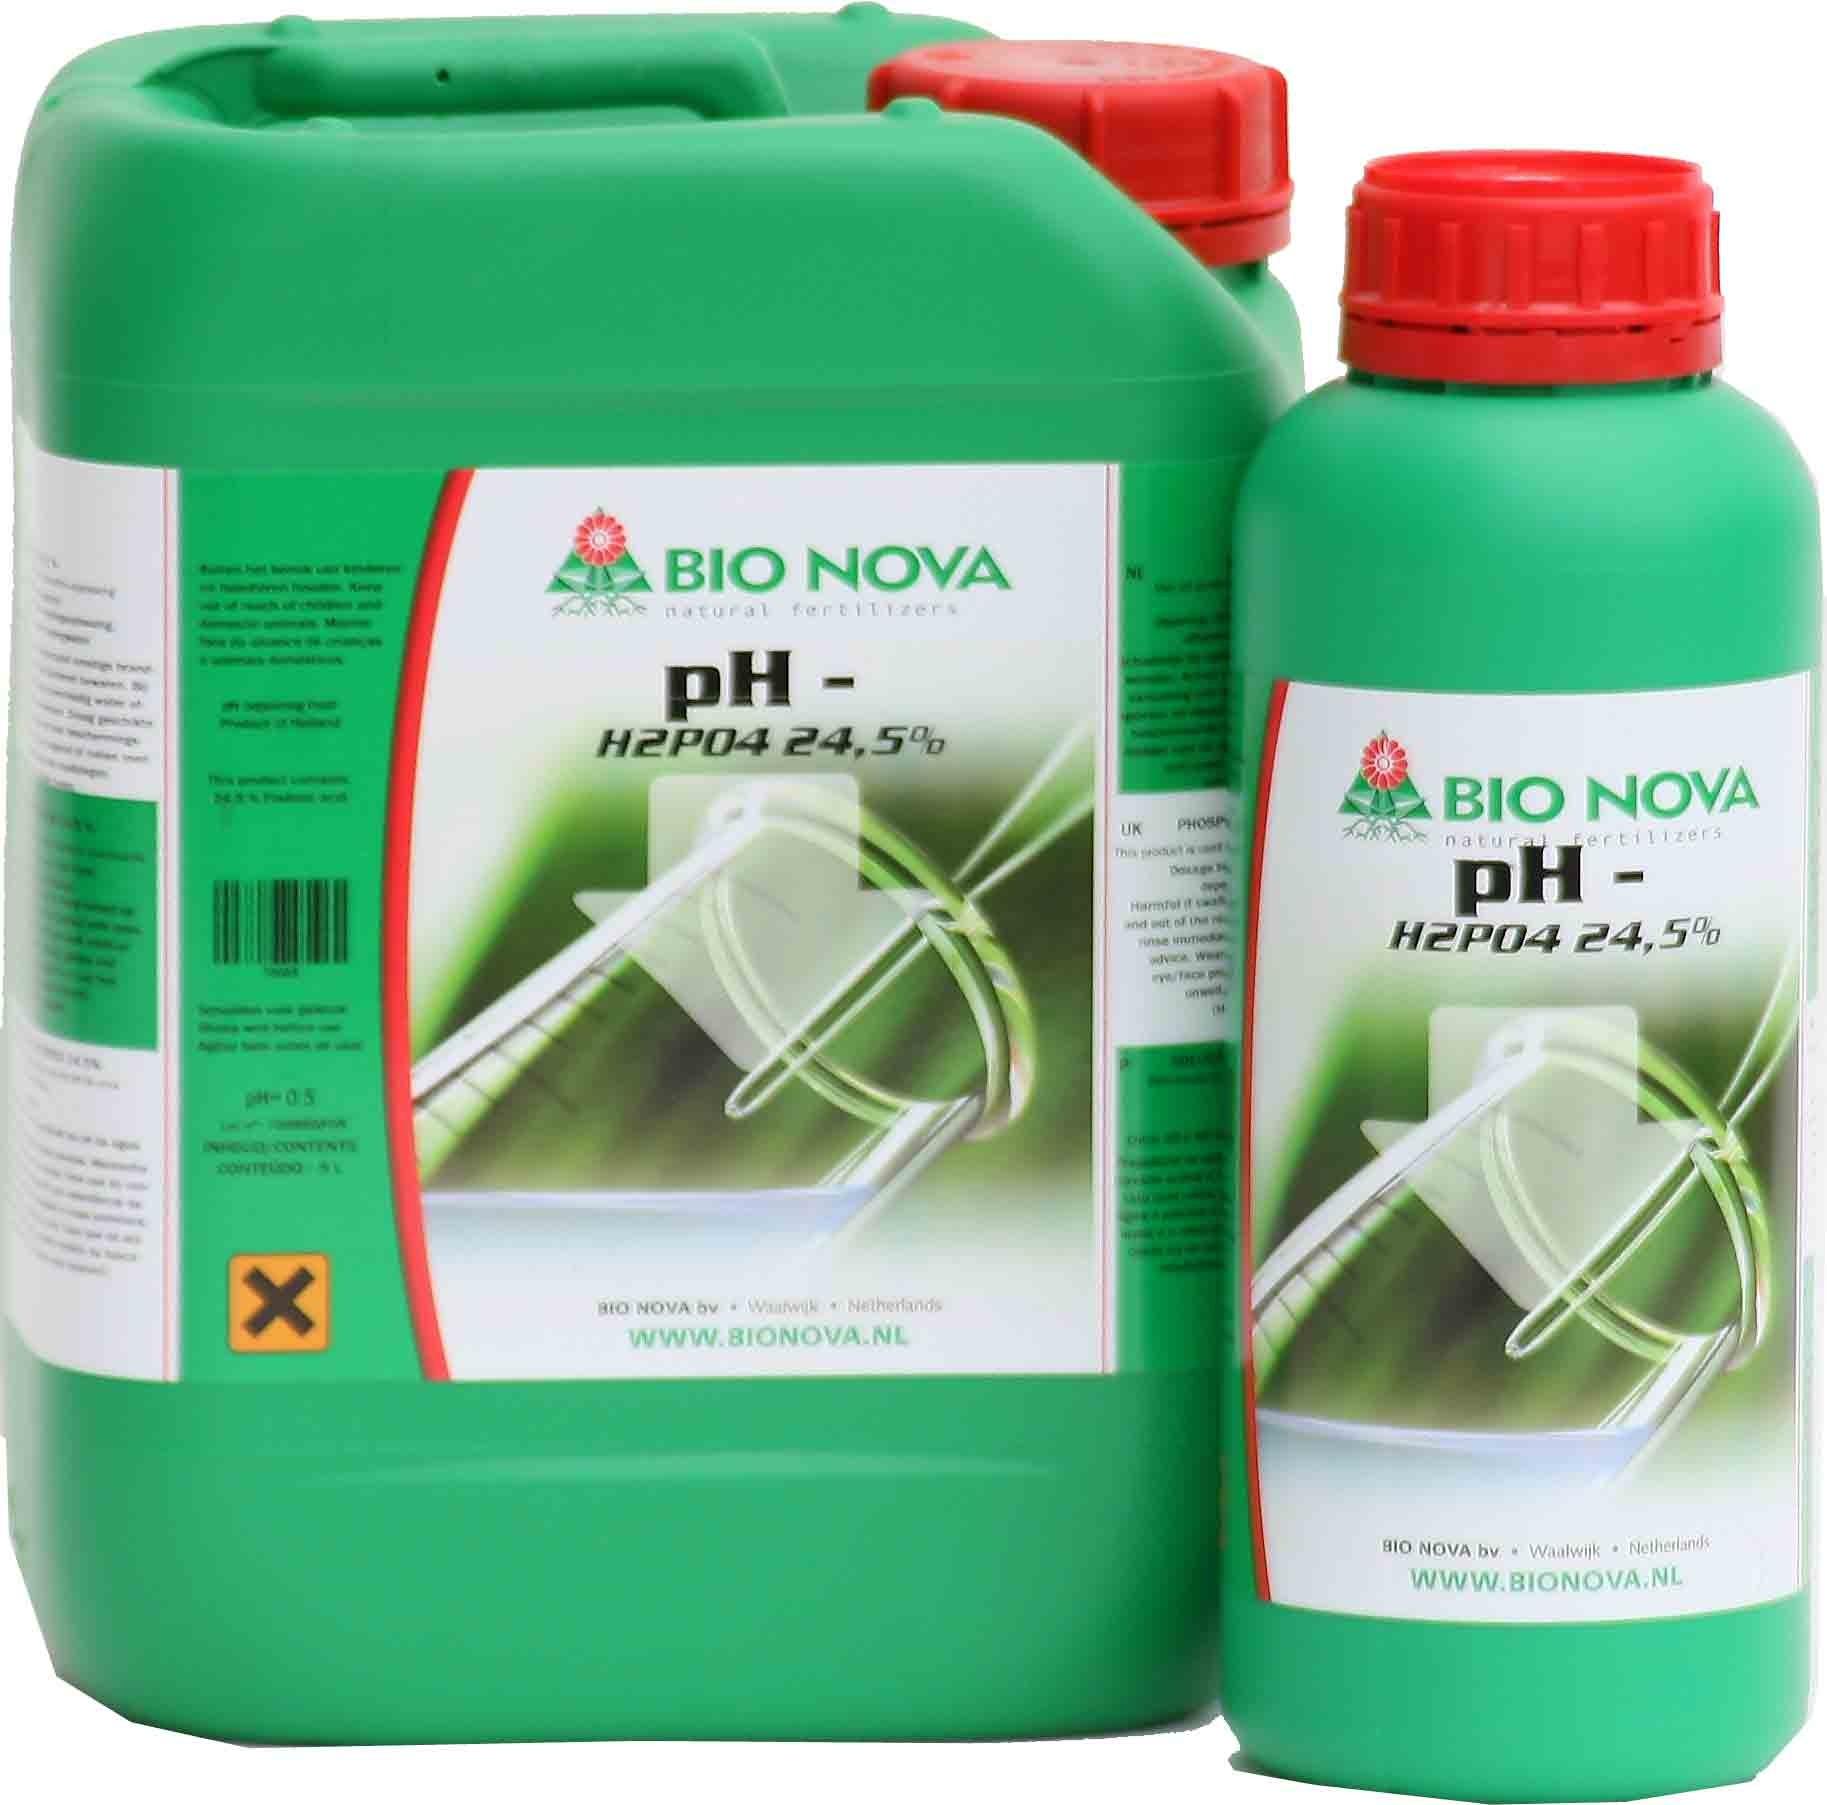 Acido Ph- de Bionova